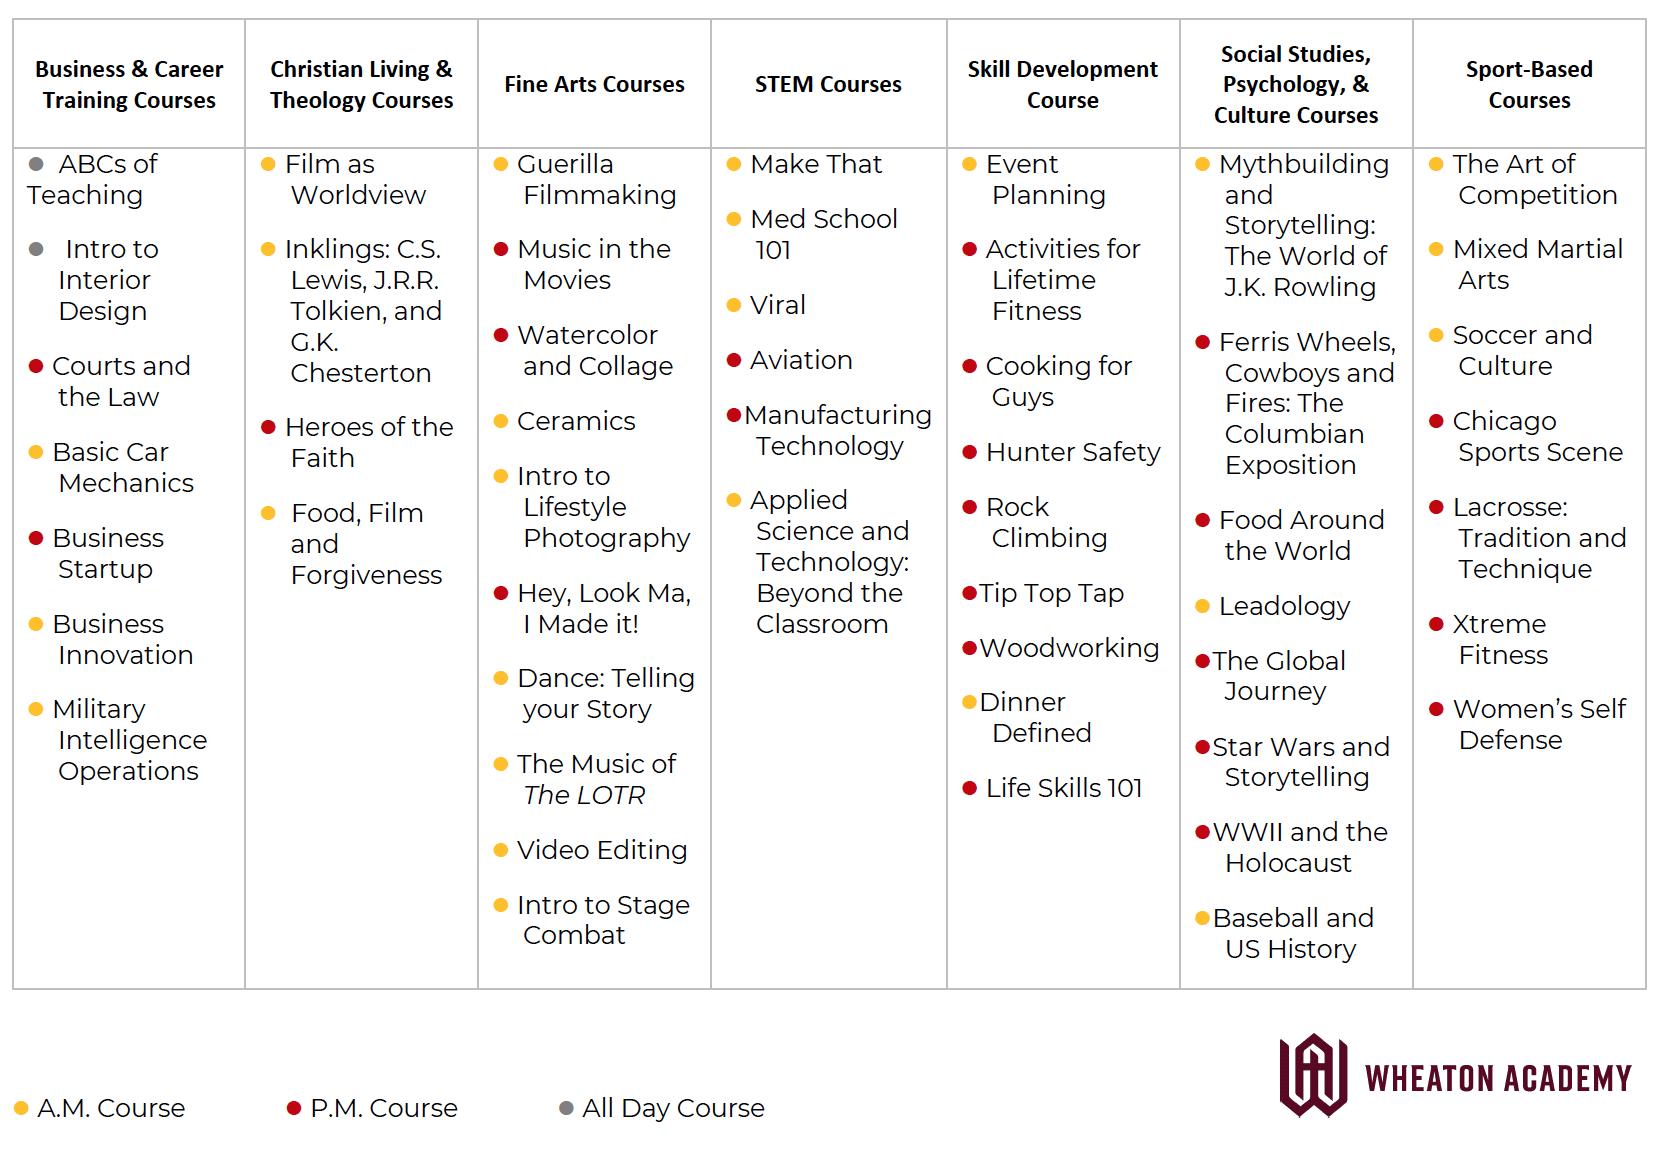 Winterim 2020 Schedule